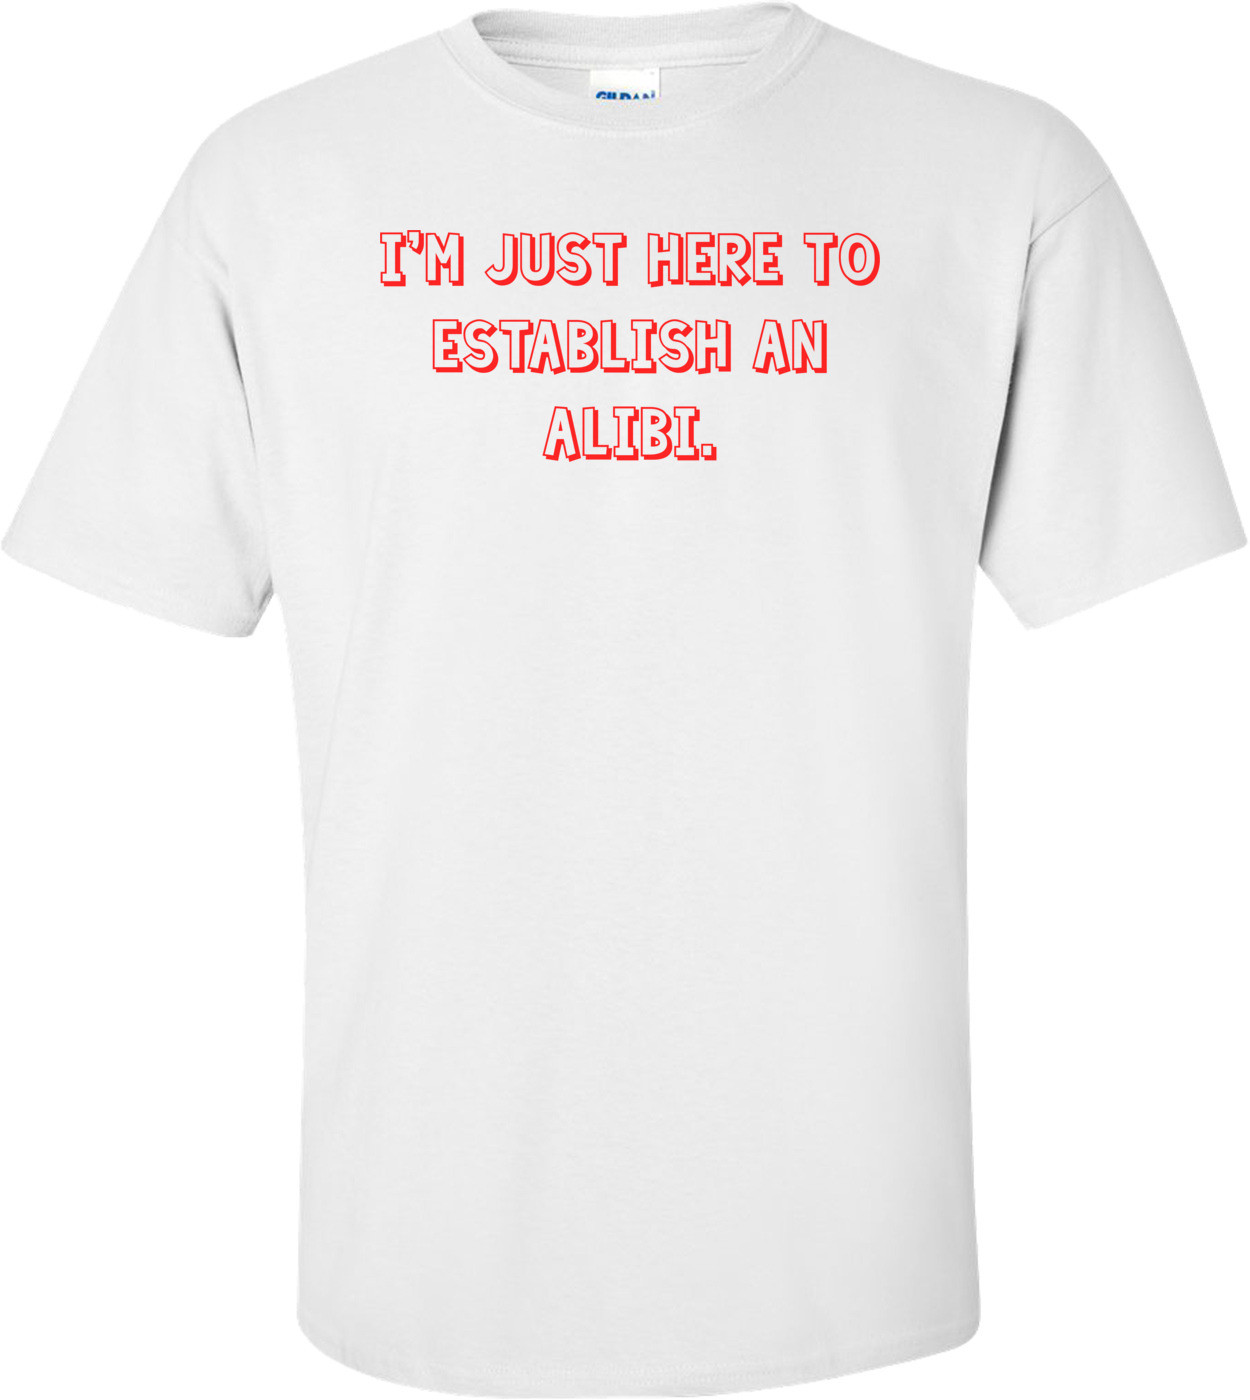 I'm just here to establish an alibi. Shirt